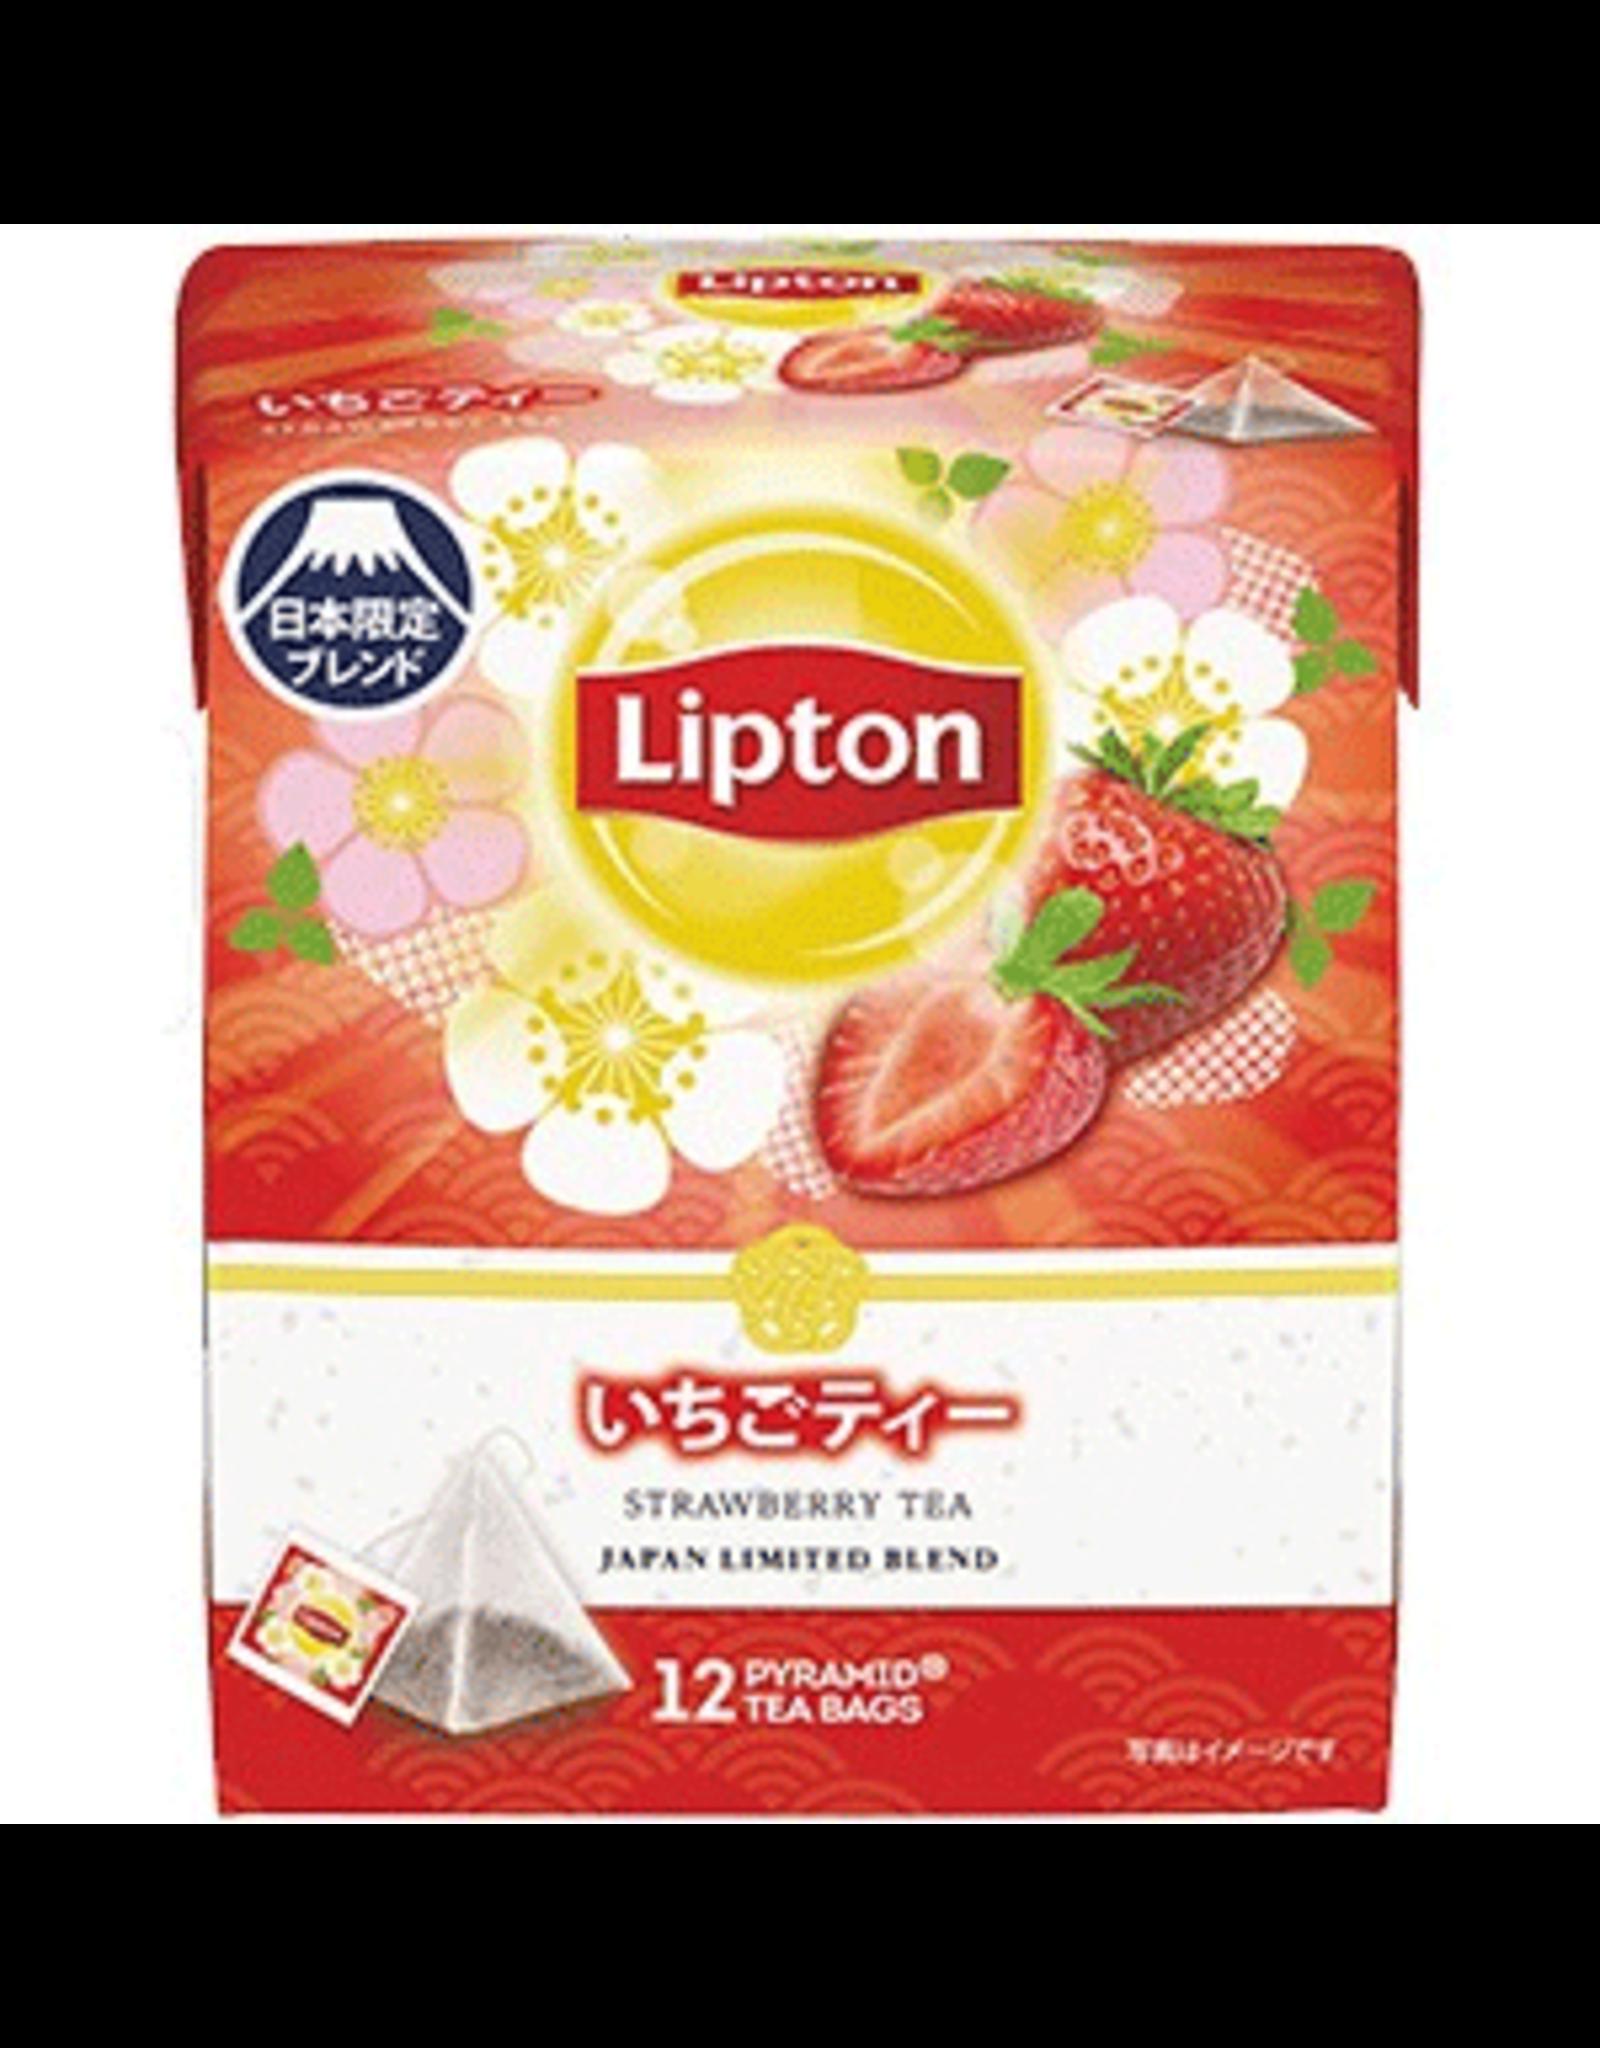 Lipton Strawberry Tea Pyramid Bag